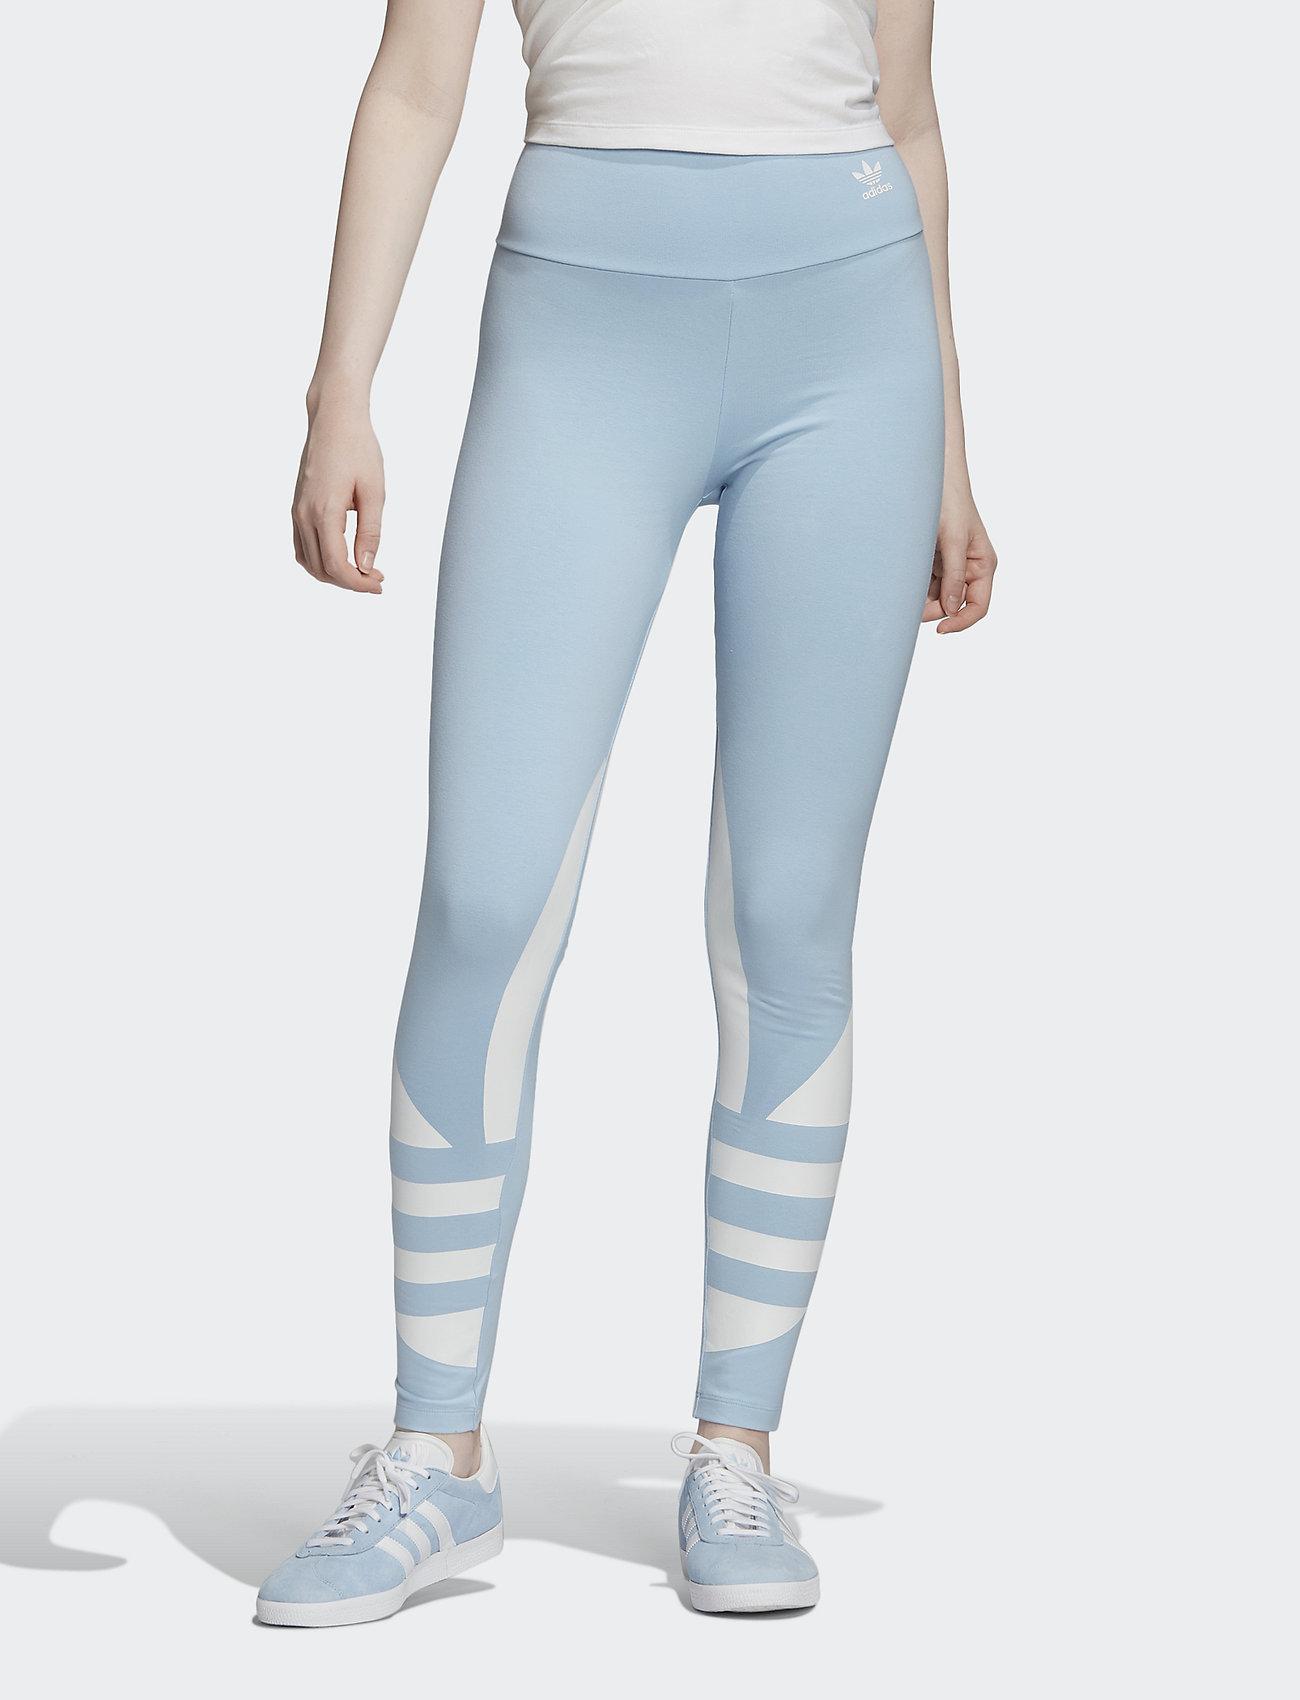 adidas Originals - LRG LOGO TIGHT - running & training tights - clesky/white - 0